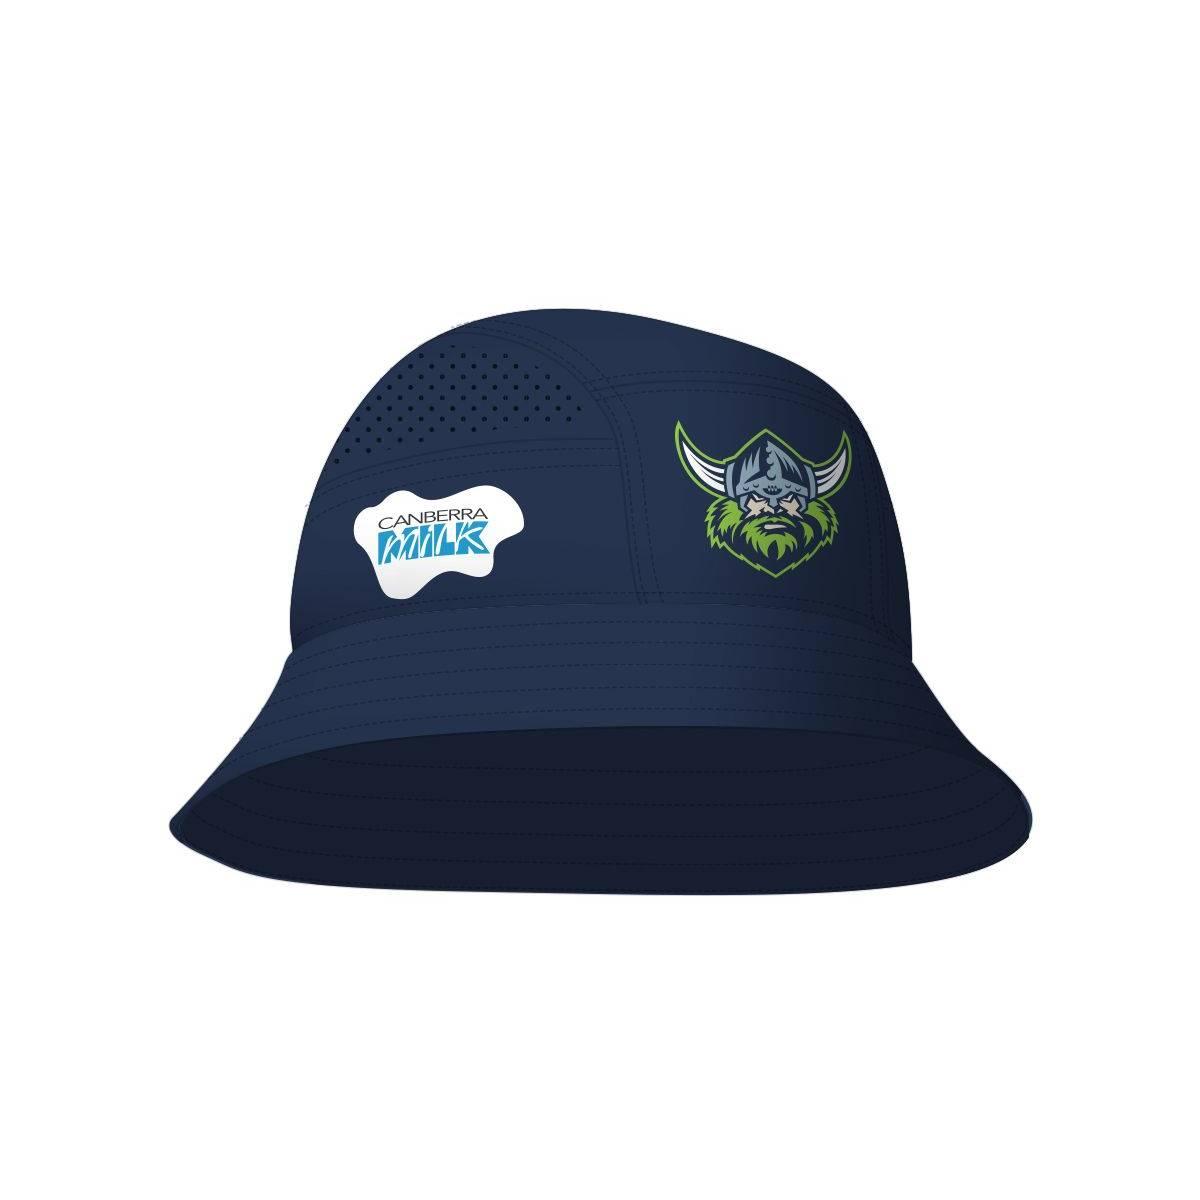 2021 Raiders Bucket Hat0